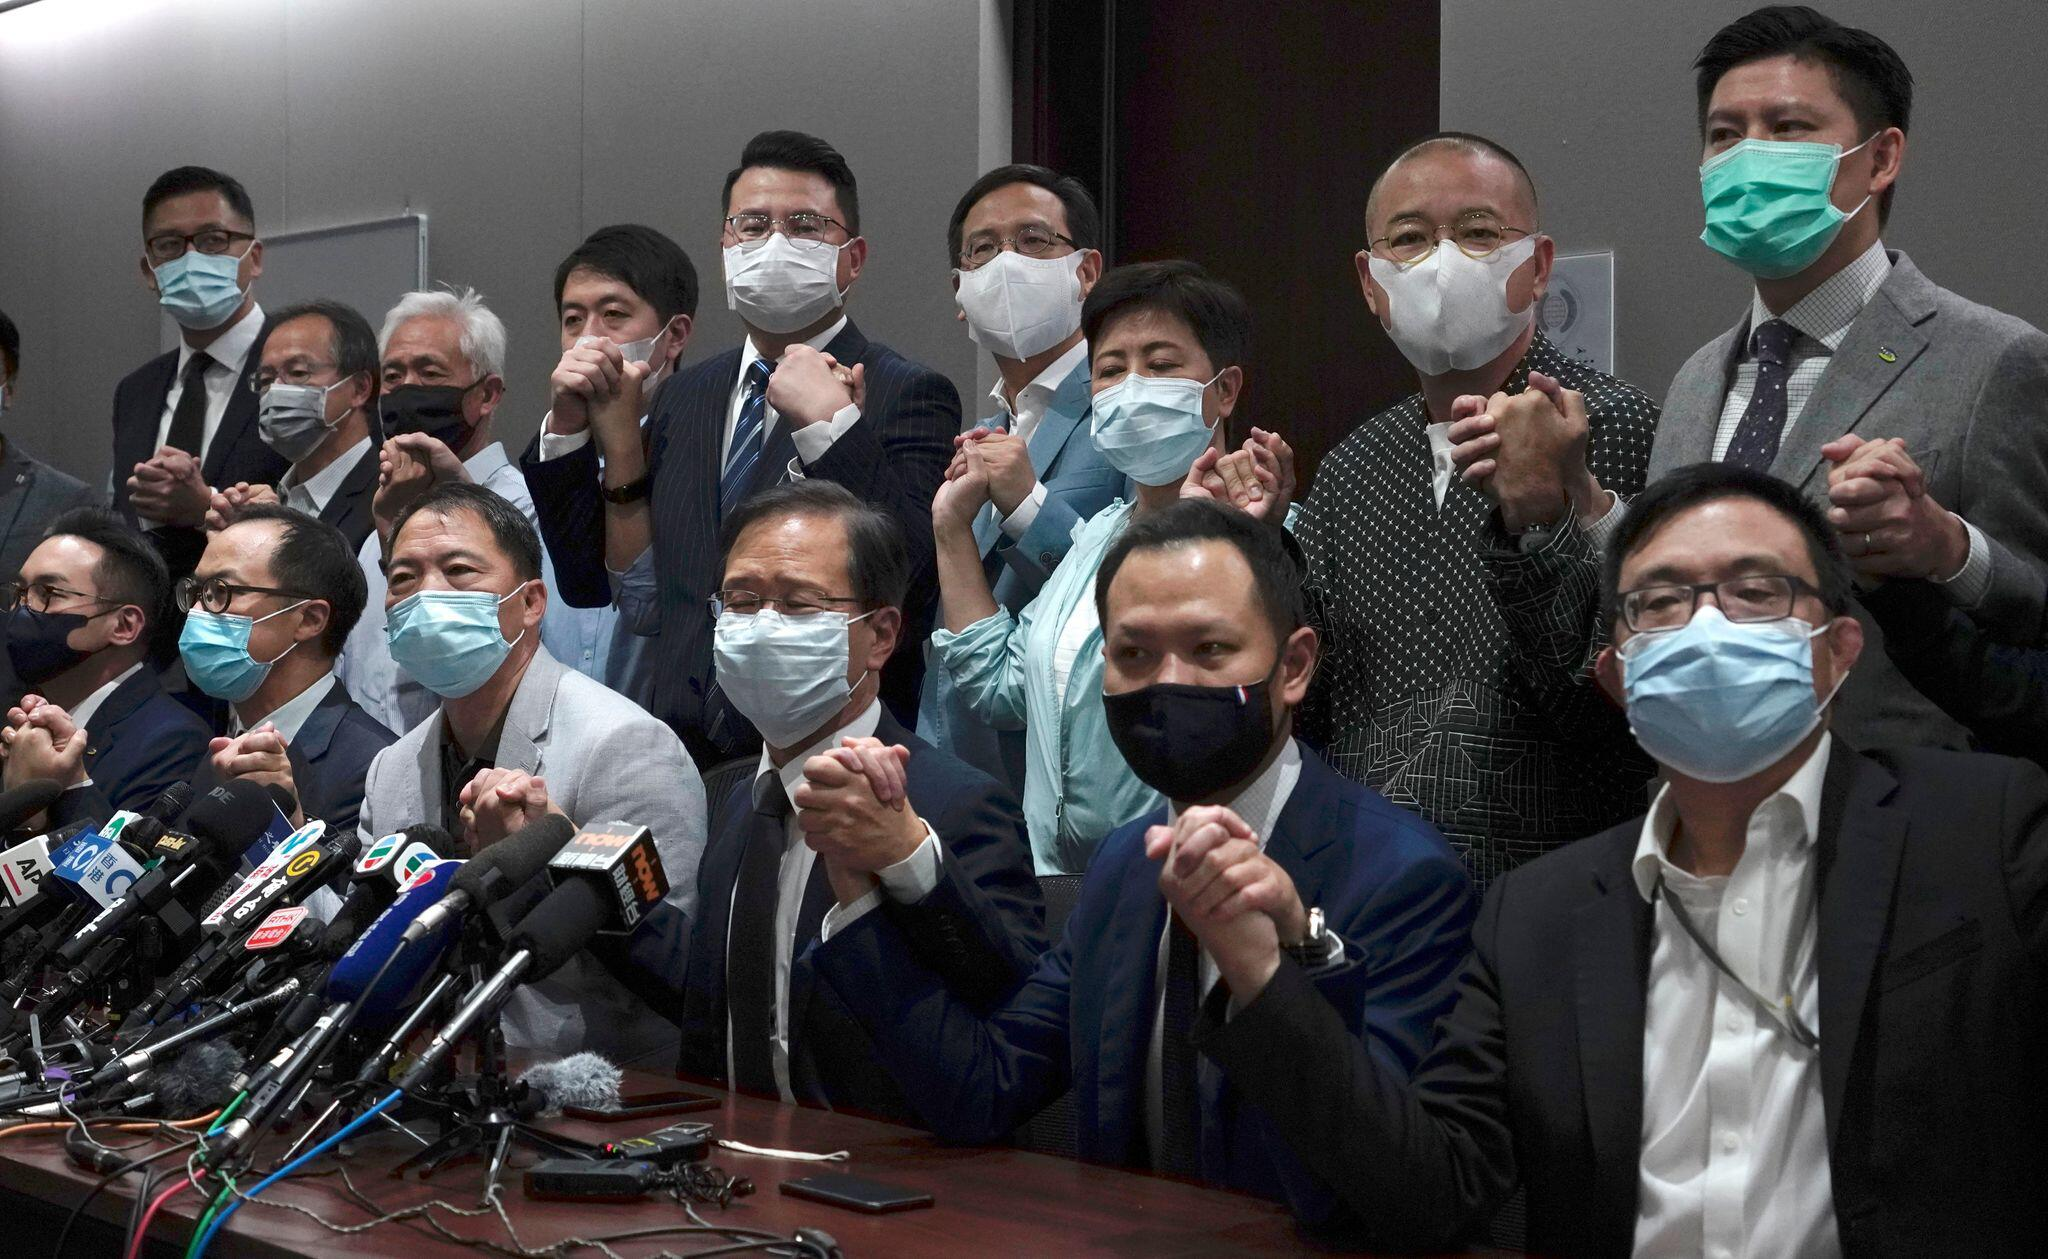 Abgeordnete des Hongkonger Demokratielagers treten aus Protest zurück